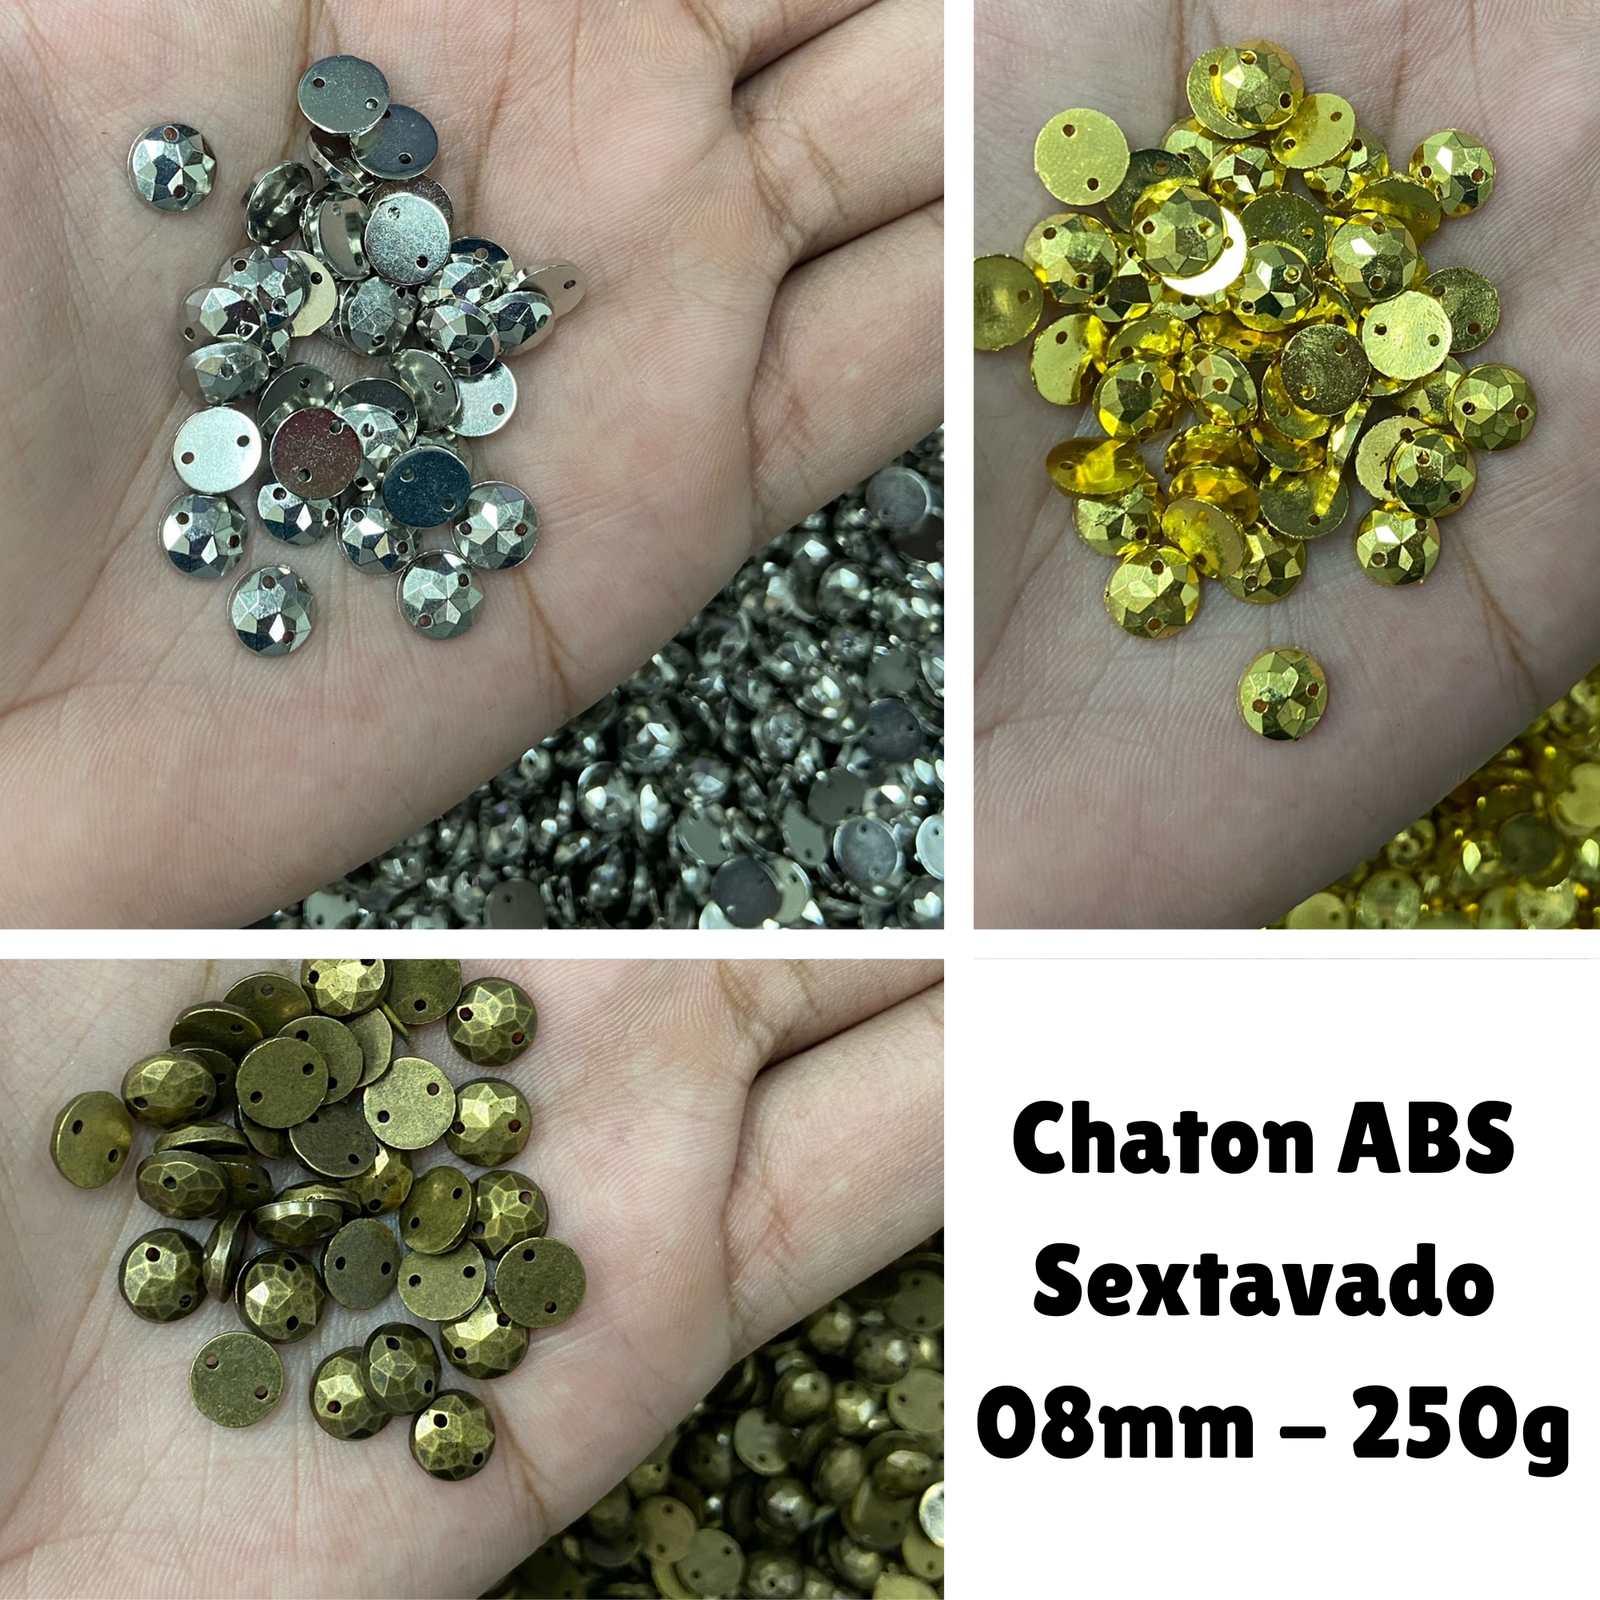 Chaton ABS  Sextavado 8mm C/250g